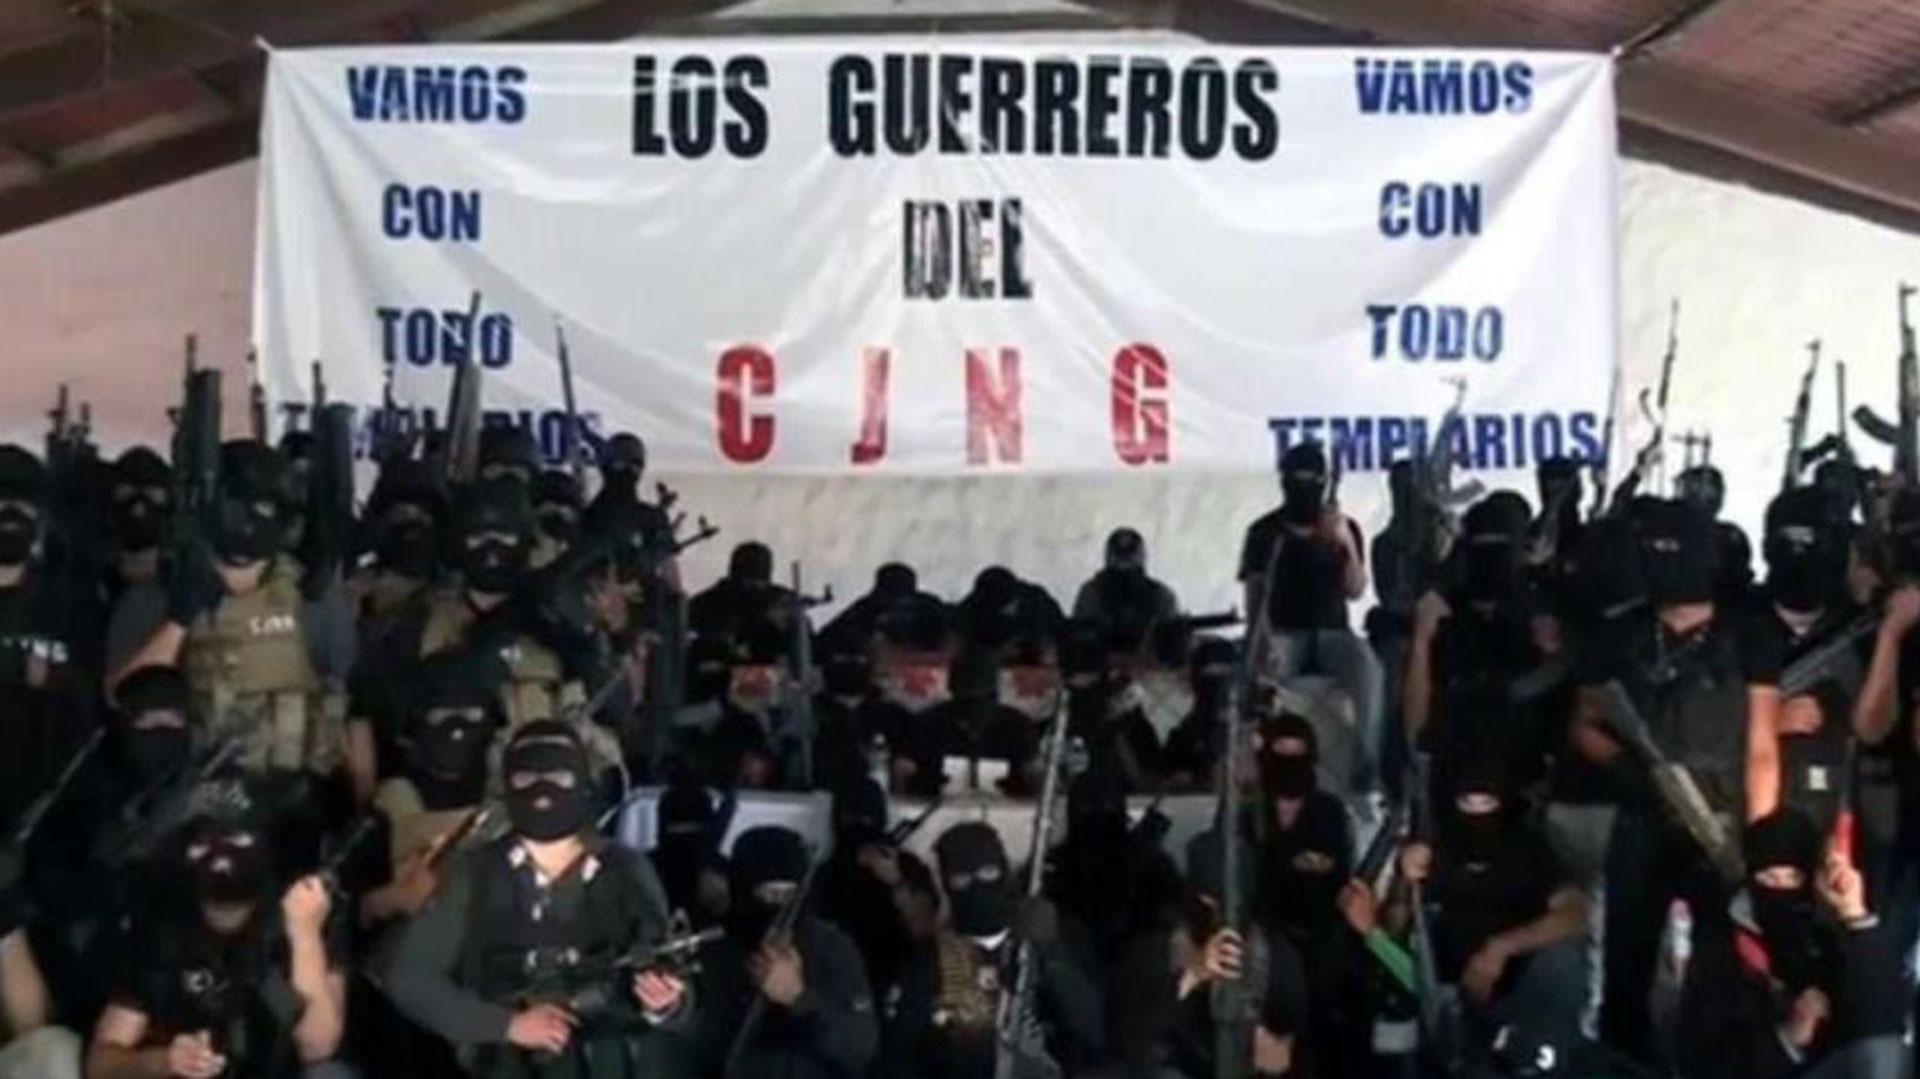 https://s3.amazonaws.com/arc-wordpress-client-uploads/infobae-wp/wp-content/uploads/2017/03/21134122/Carteles-de-Mexico-1920-7.jpg